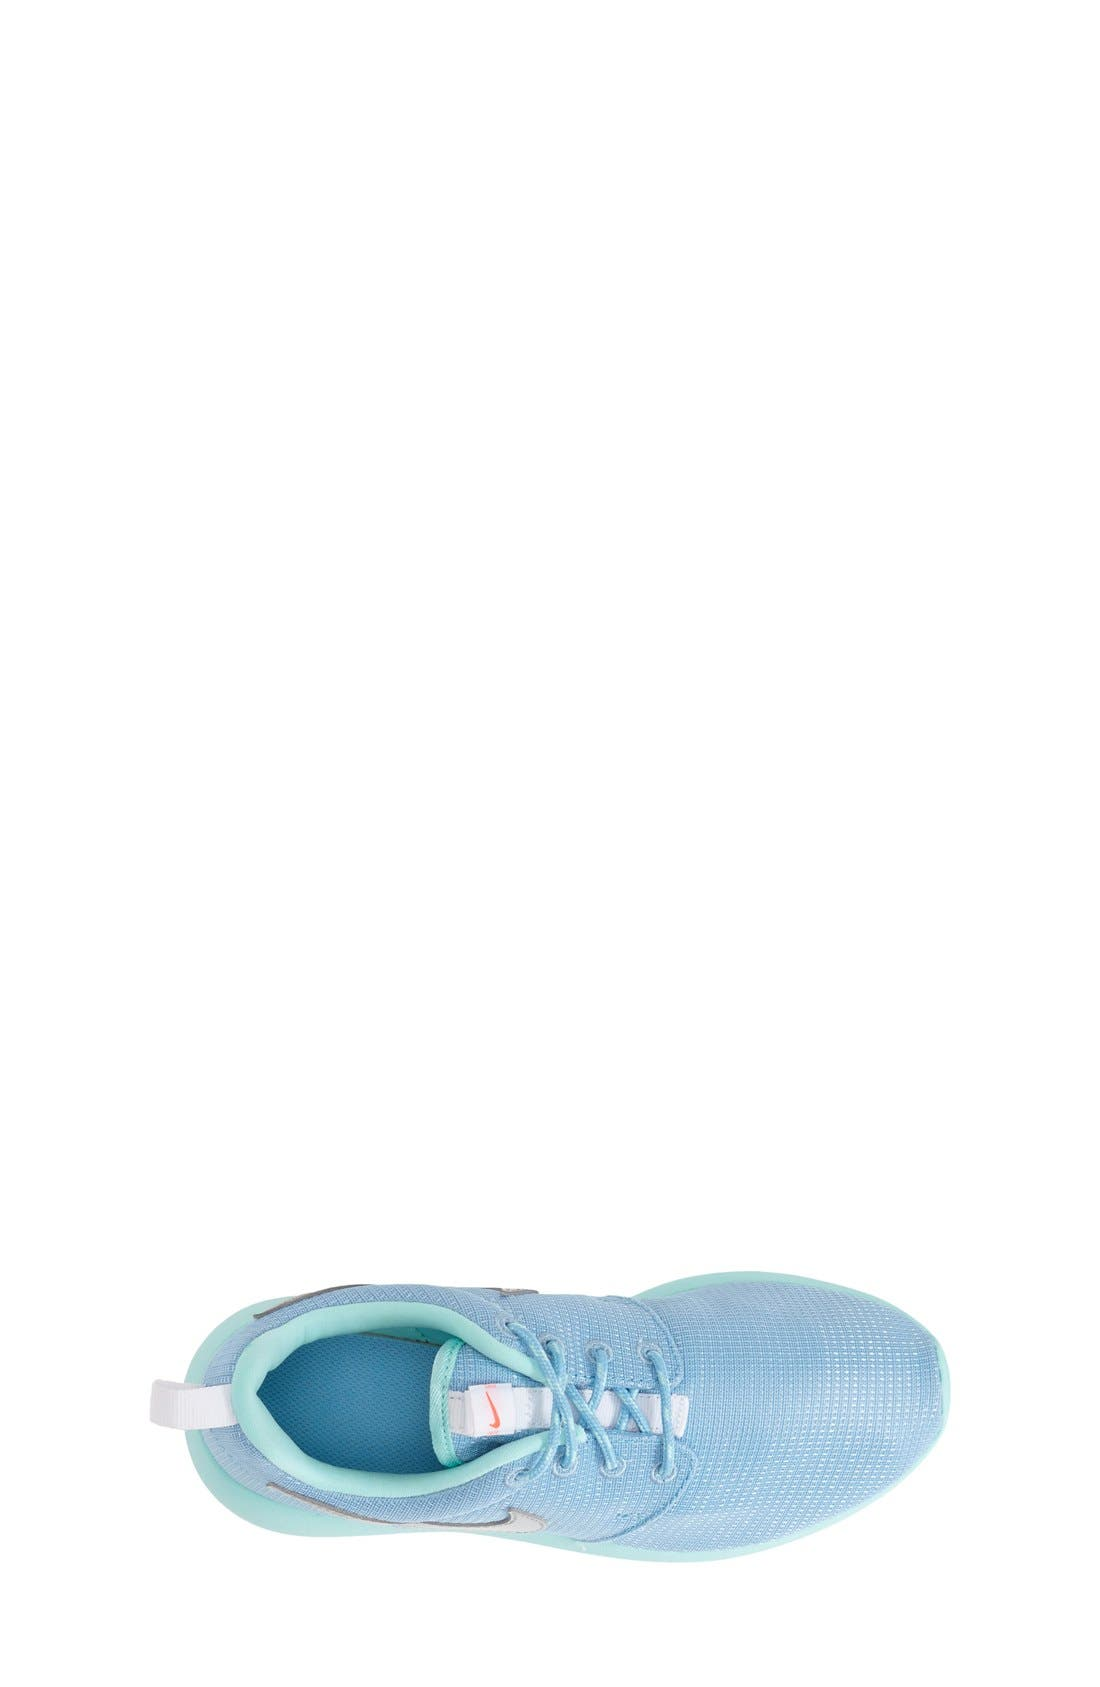 'Roshe Run' Athletic Shoe,                             Alternate thumbnail 168, color,